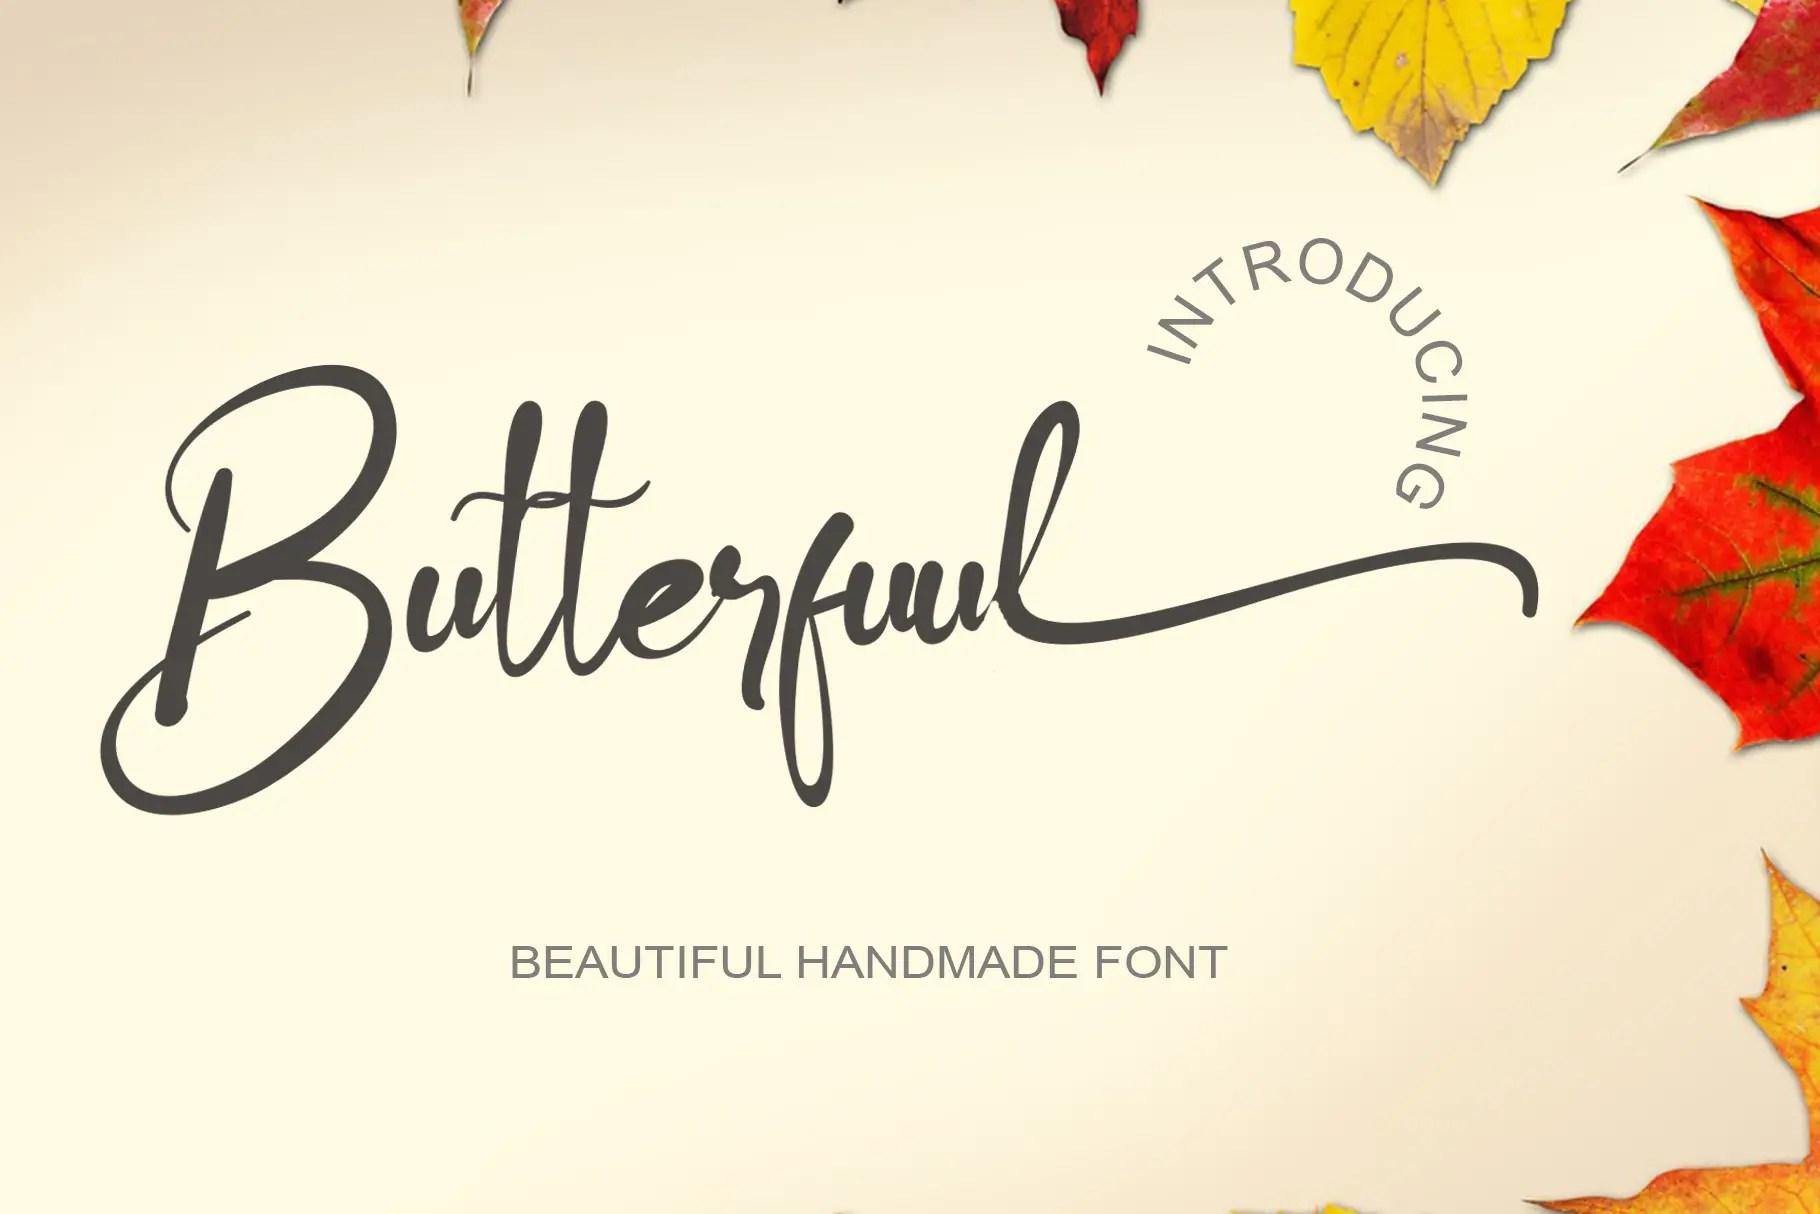 Butterfuul Script Calligraphy Font -1